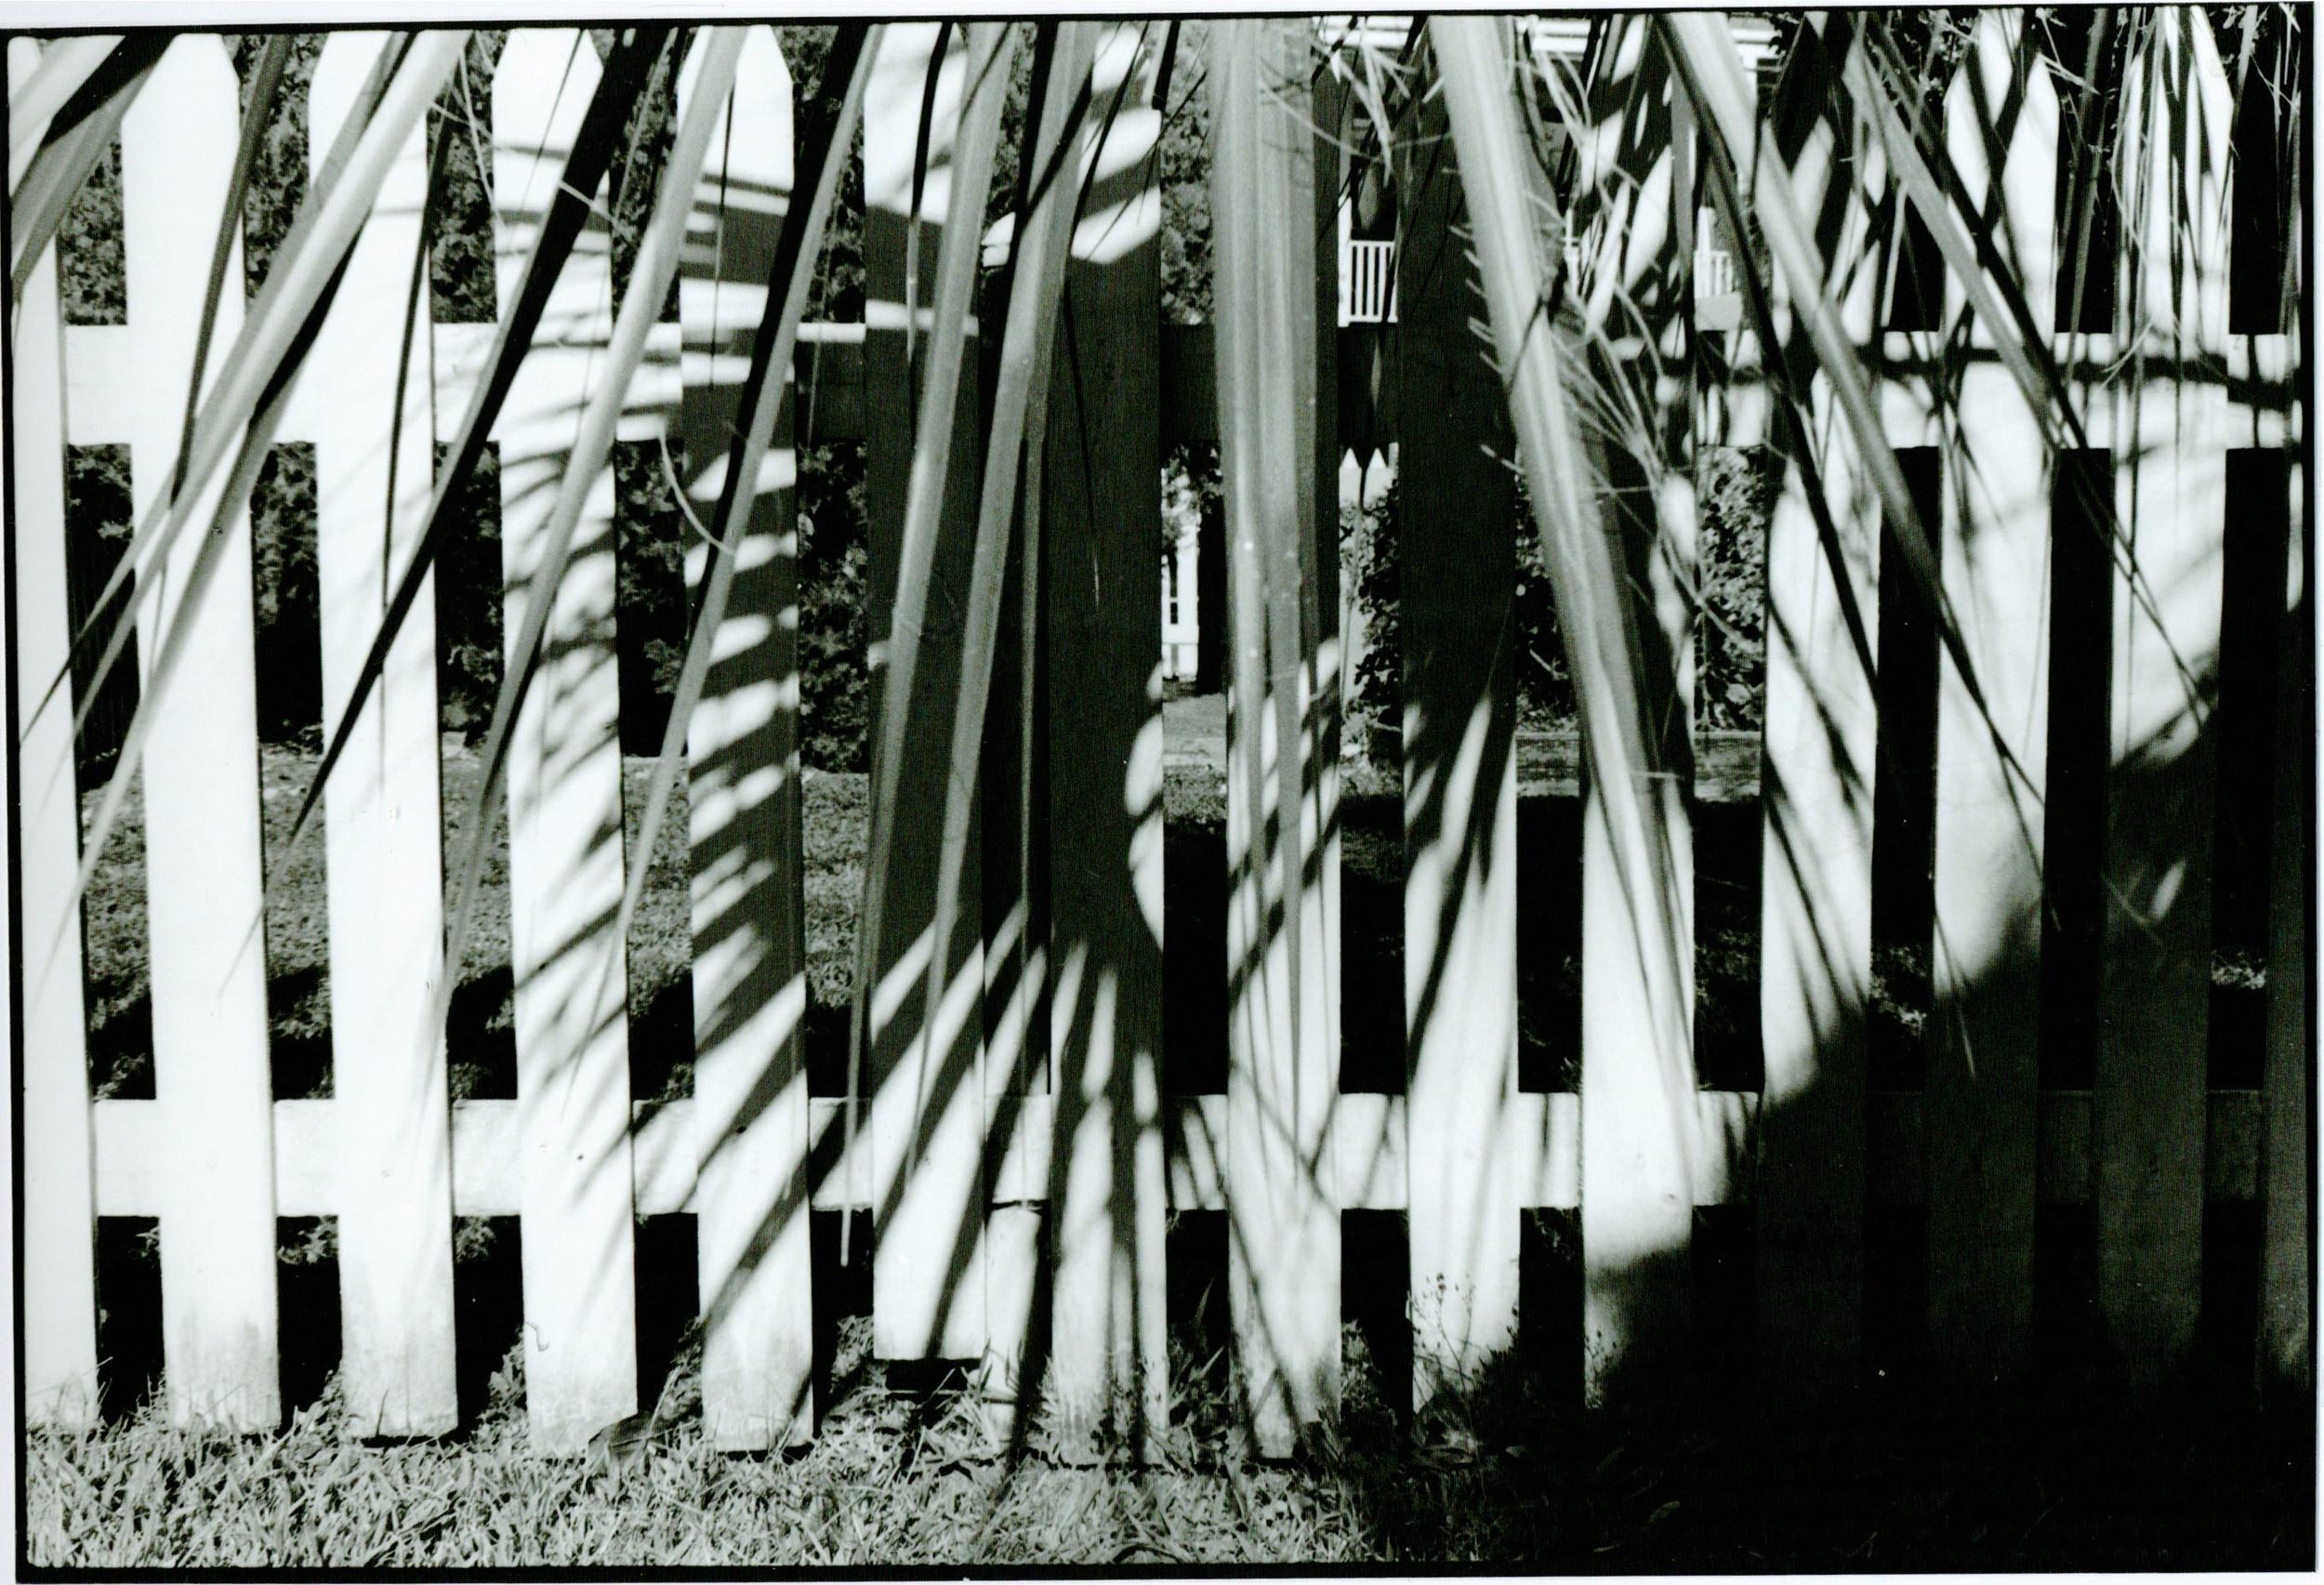 leaves on fence copy.jpg